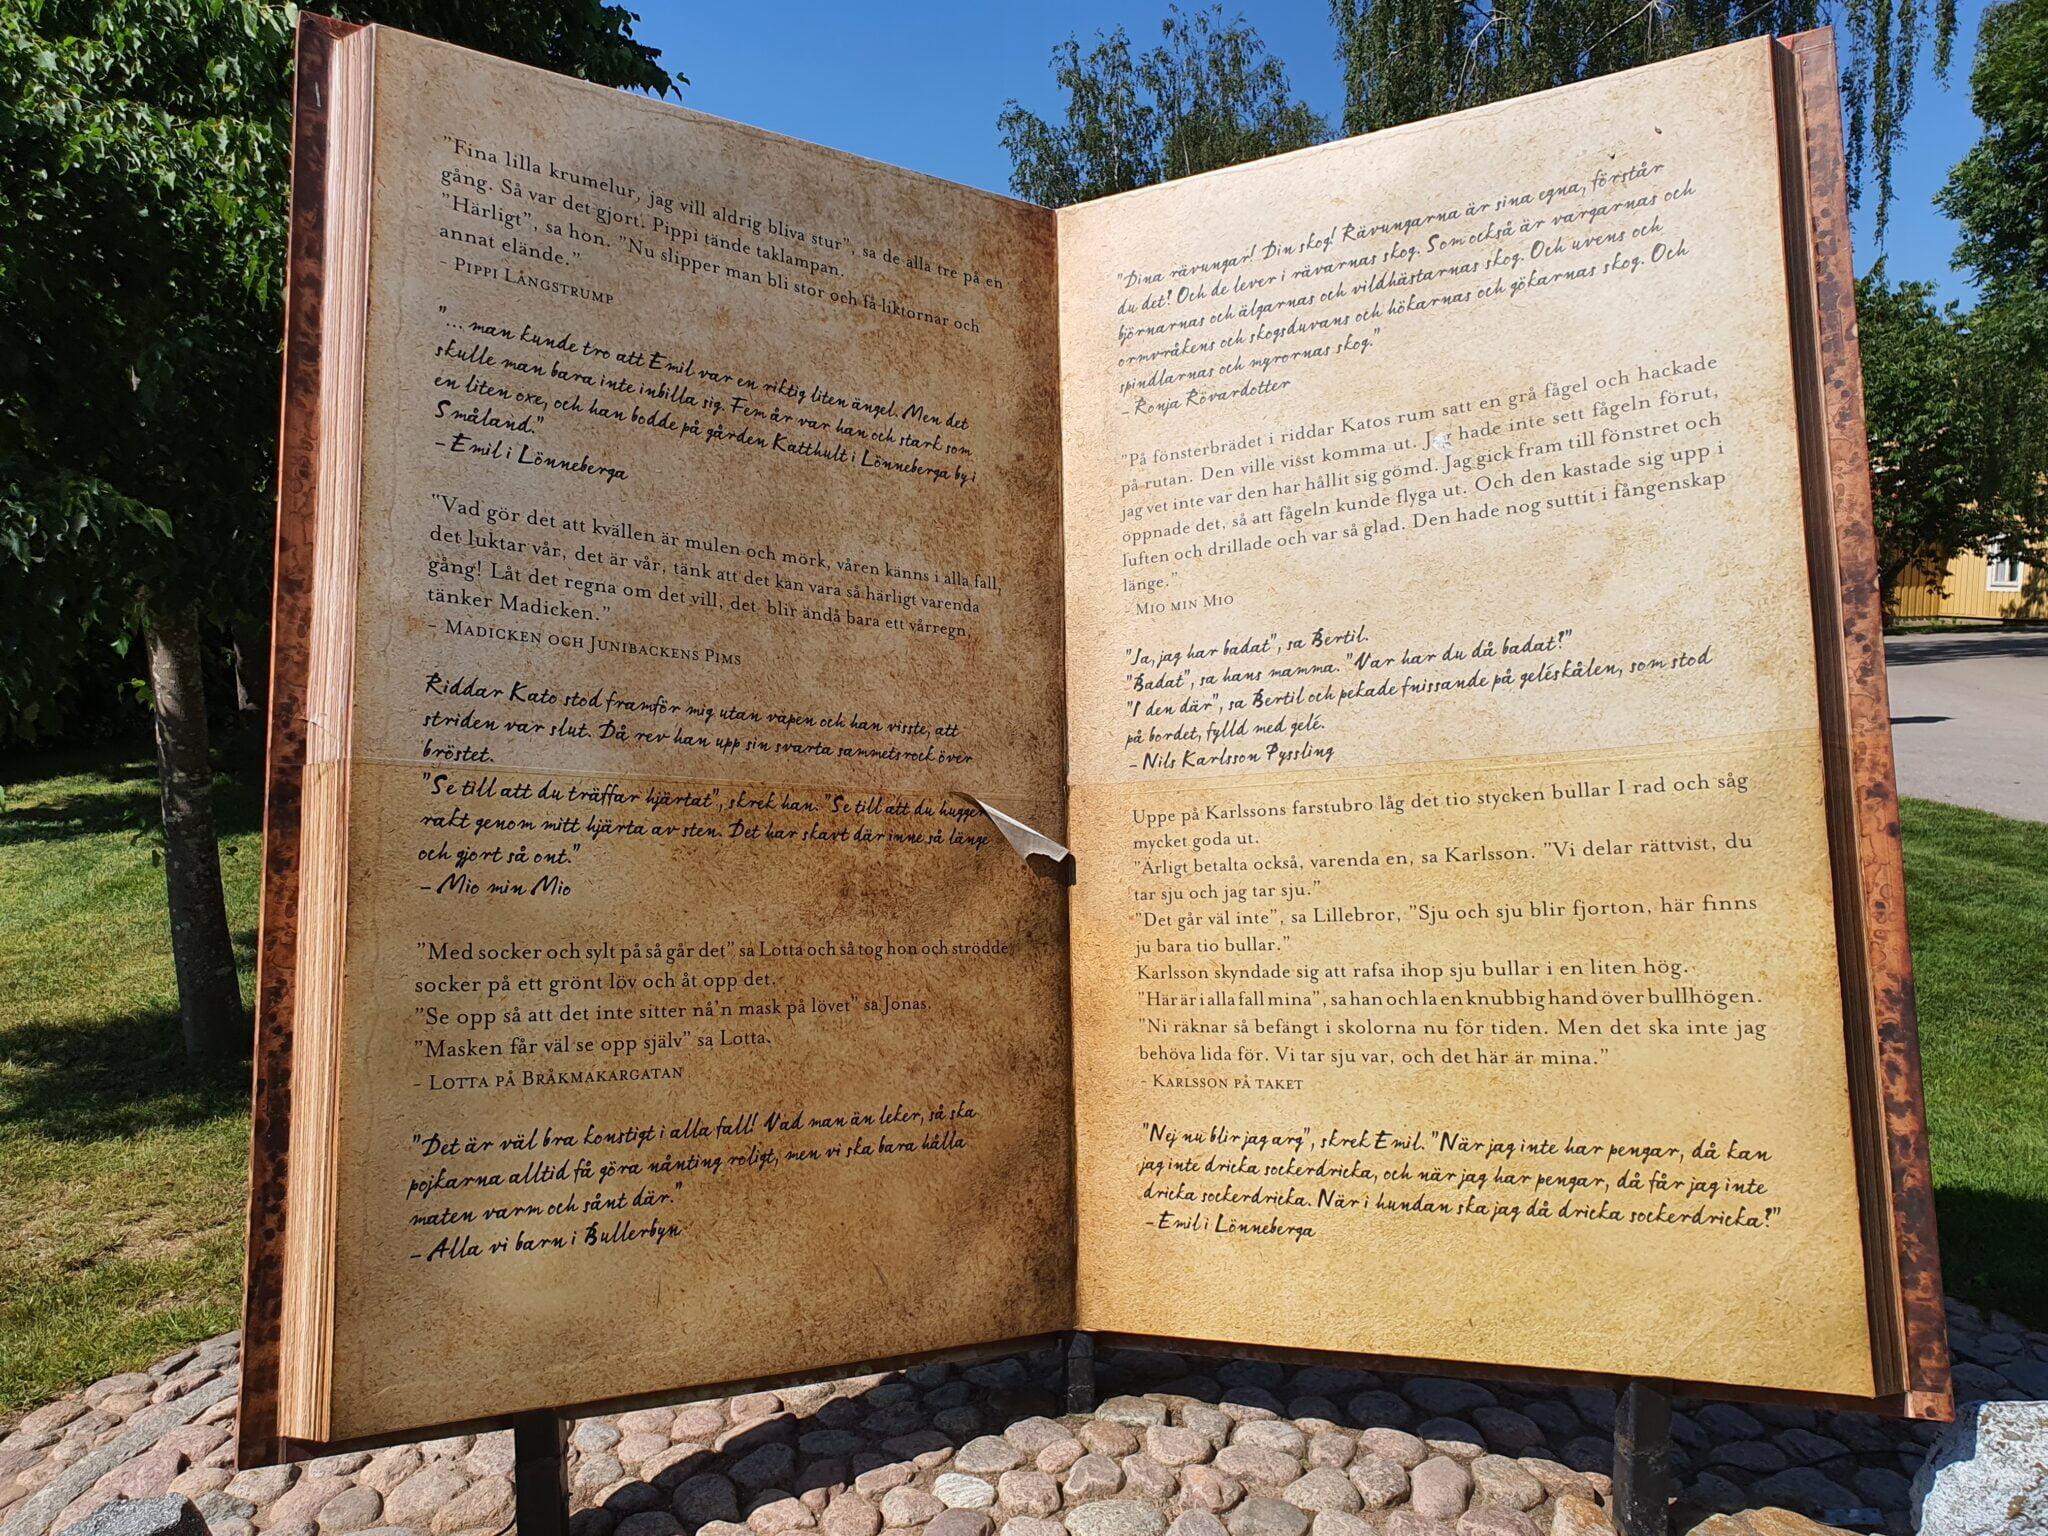 Astrid Lindgrens Tales